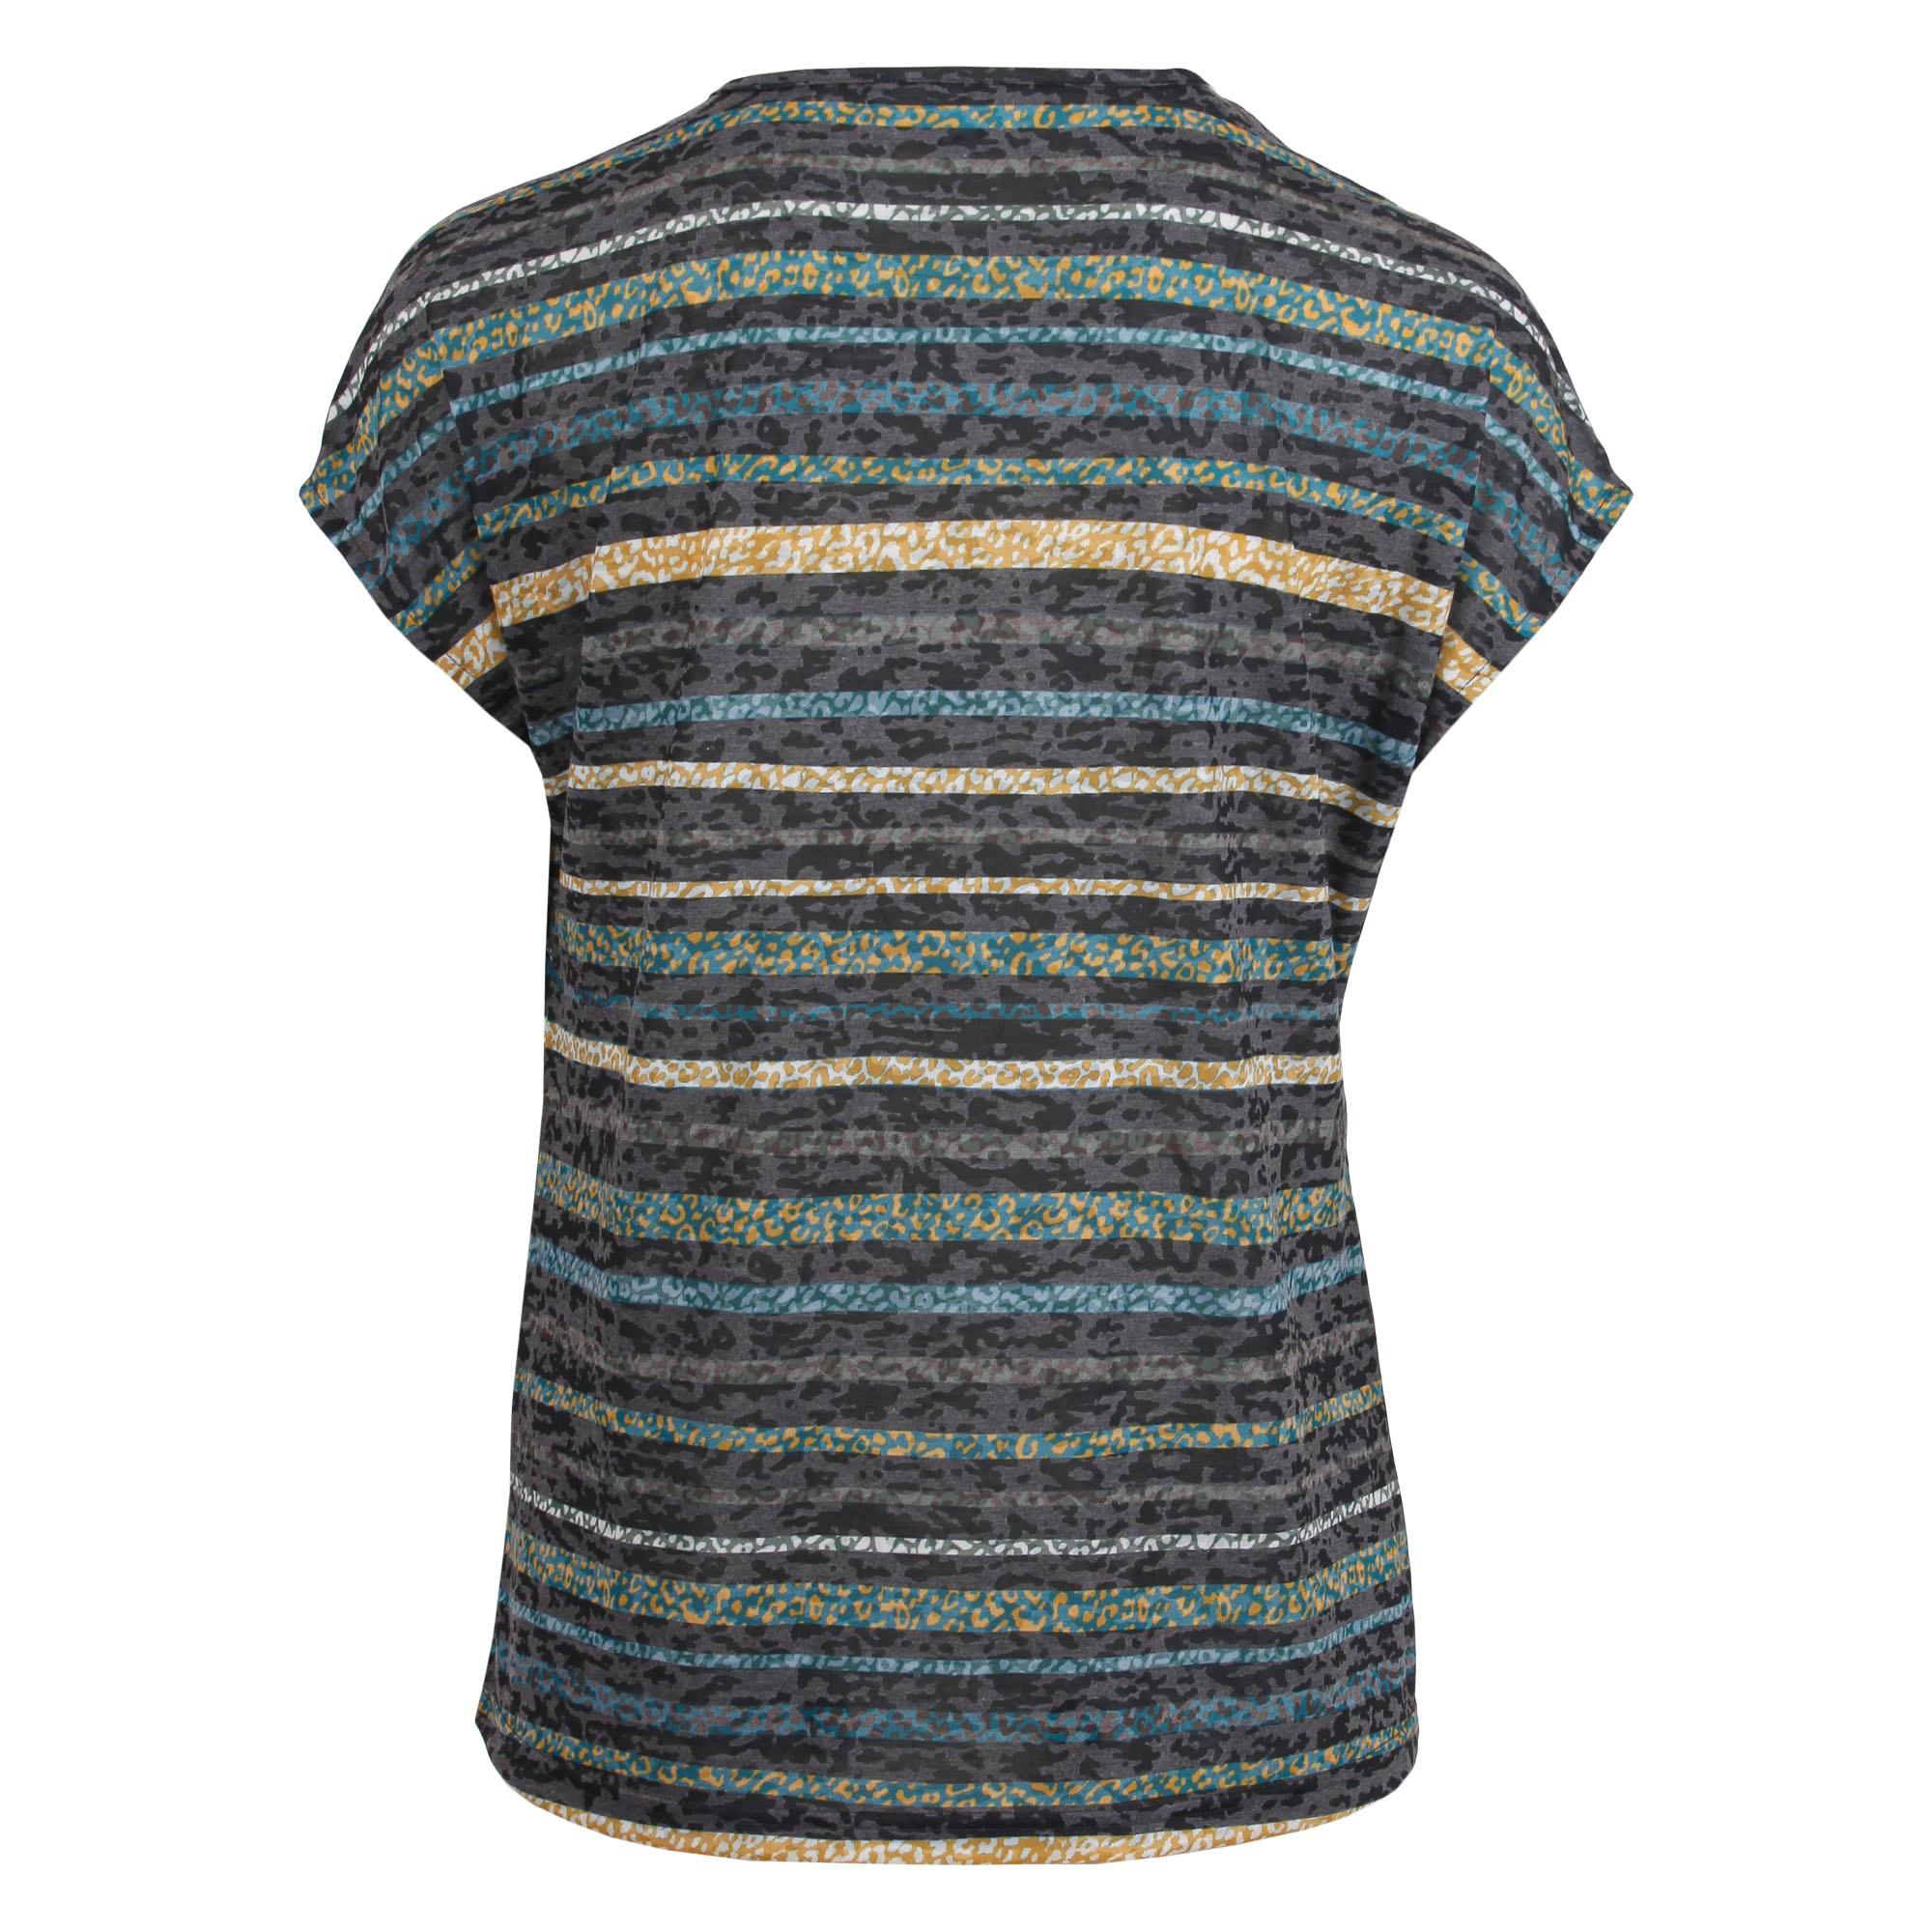 Enjoy Dames Shirt Devore Strepen Bladeren 168699-2